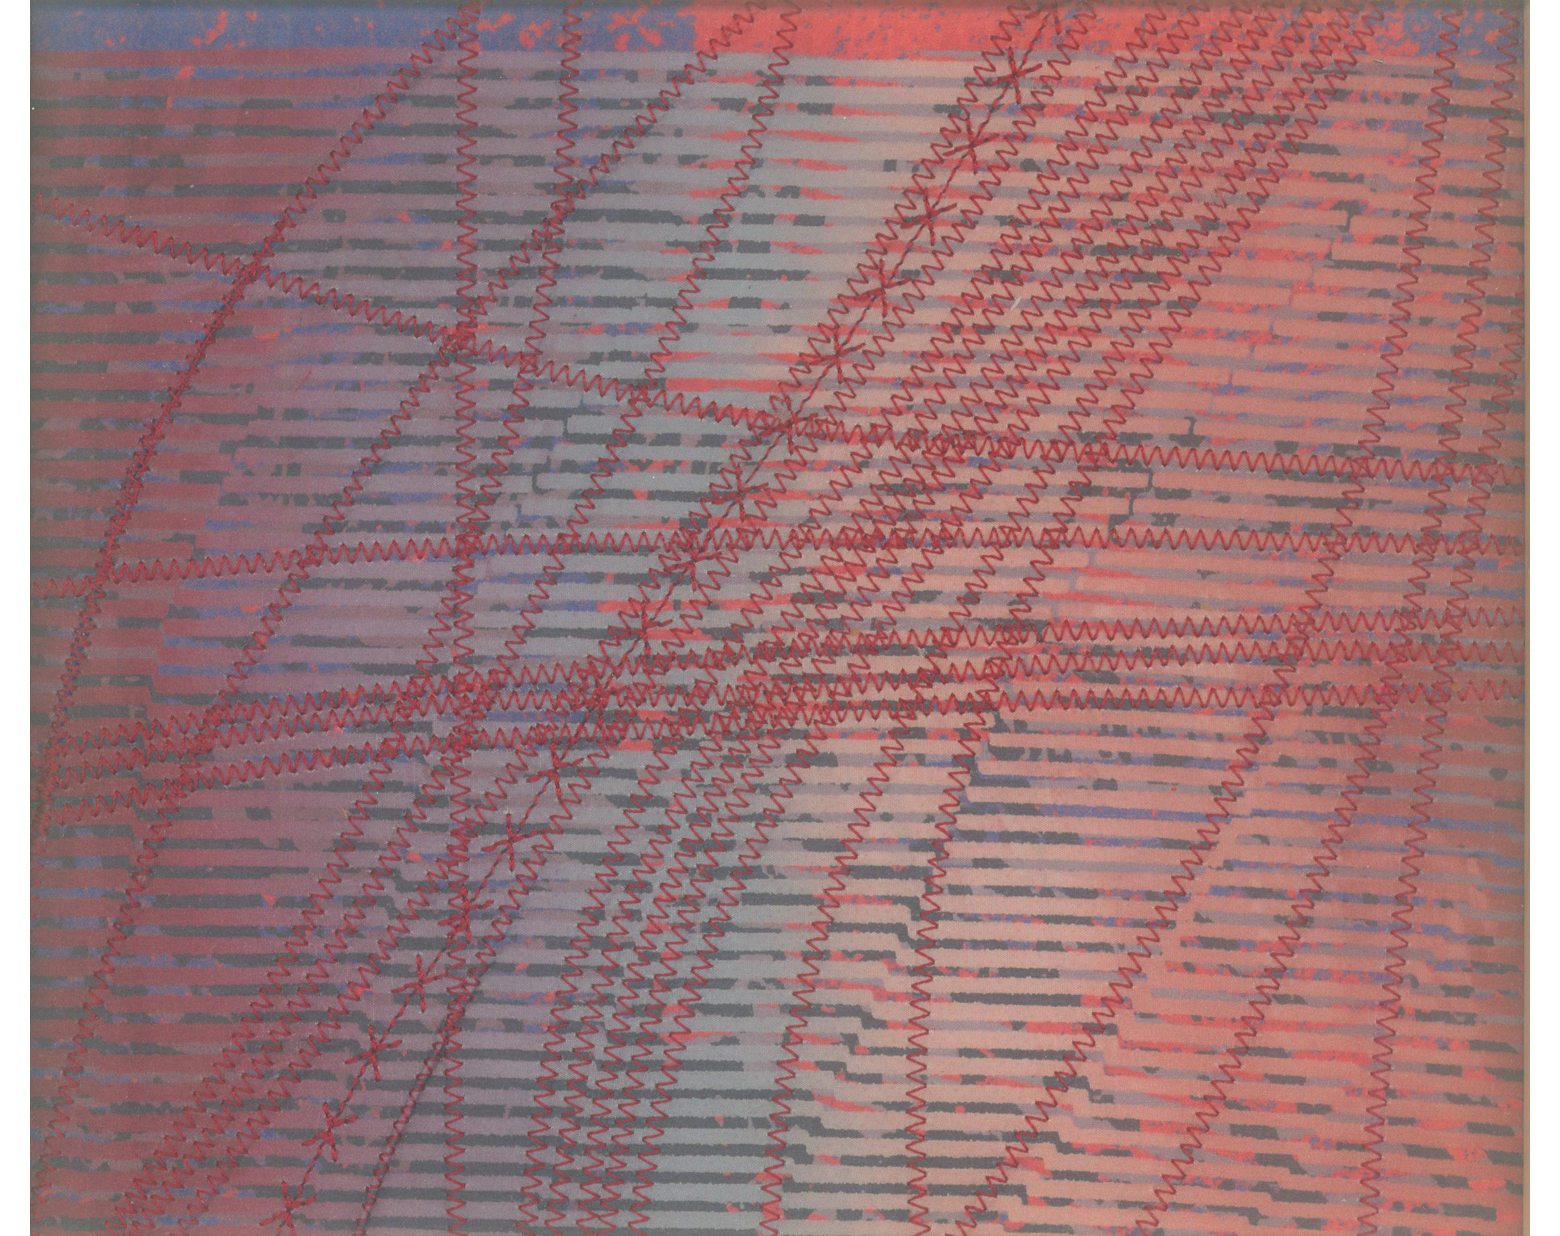 11_1_Larry__Schulte__Red Stitches 2.jpg